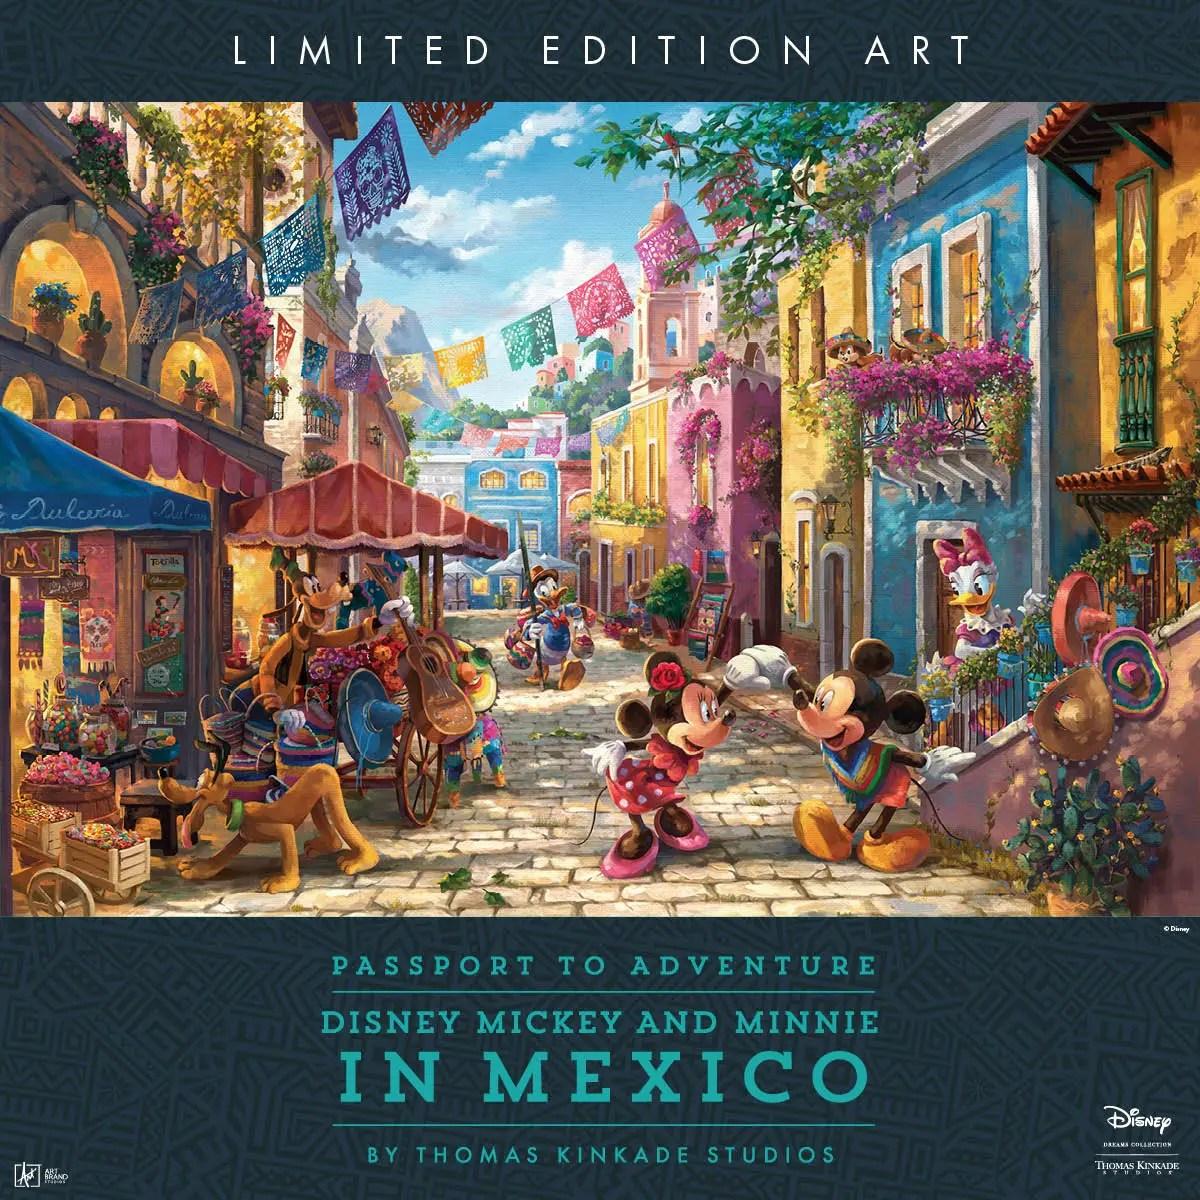 Thomas Kinkade Studios Legacy Artist Dirk Wunderlich will be making appearances at The Art of Disney in Disney Springs. 2